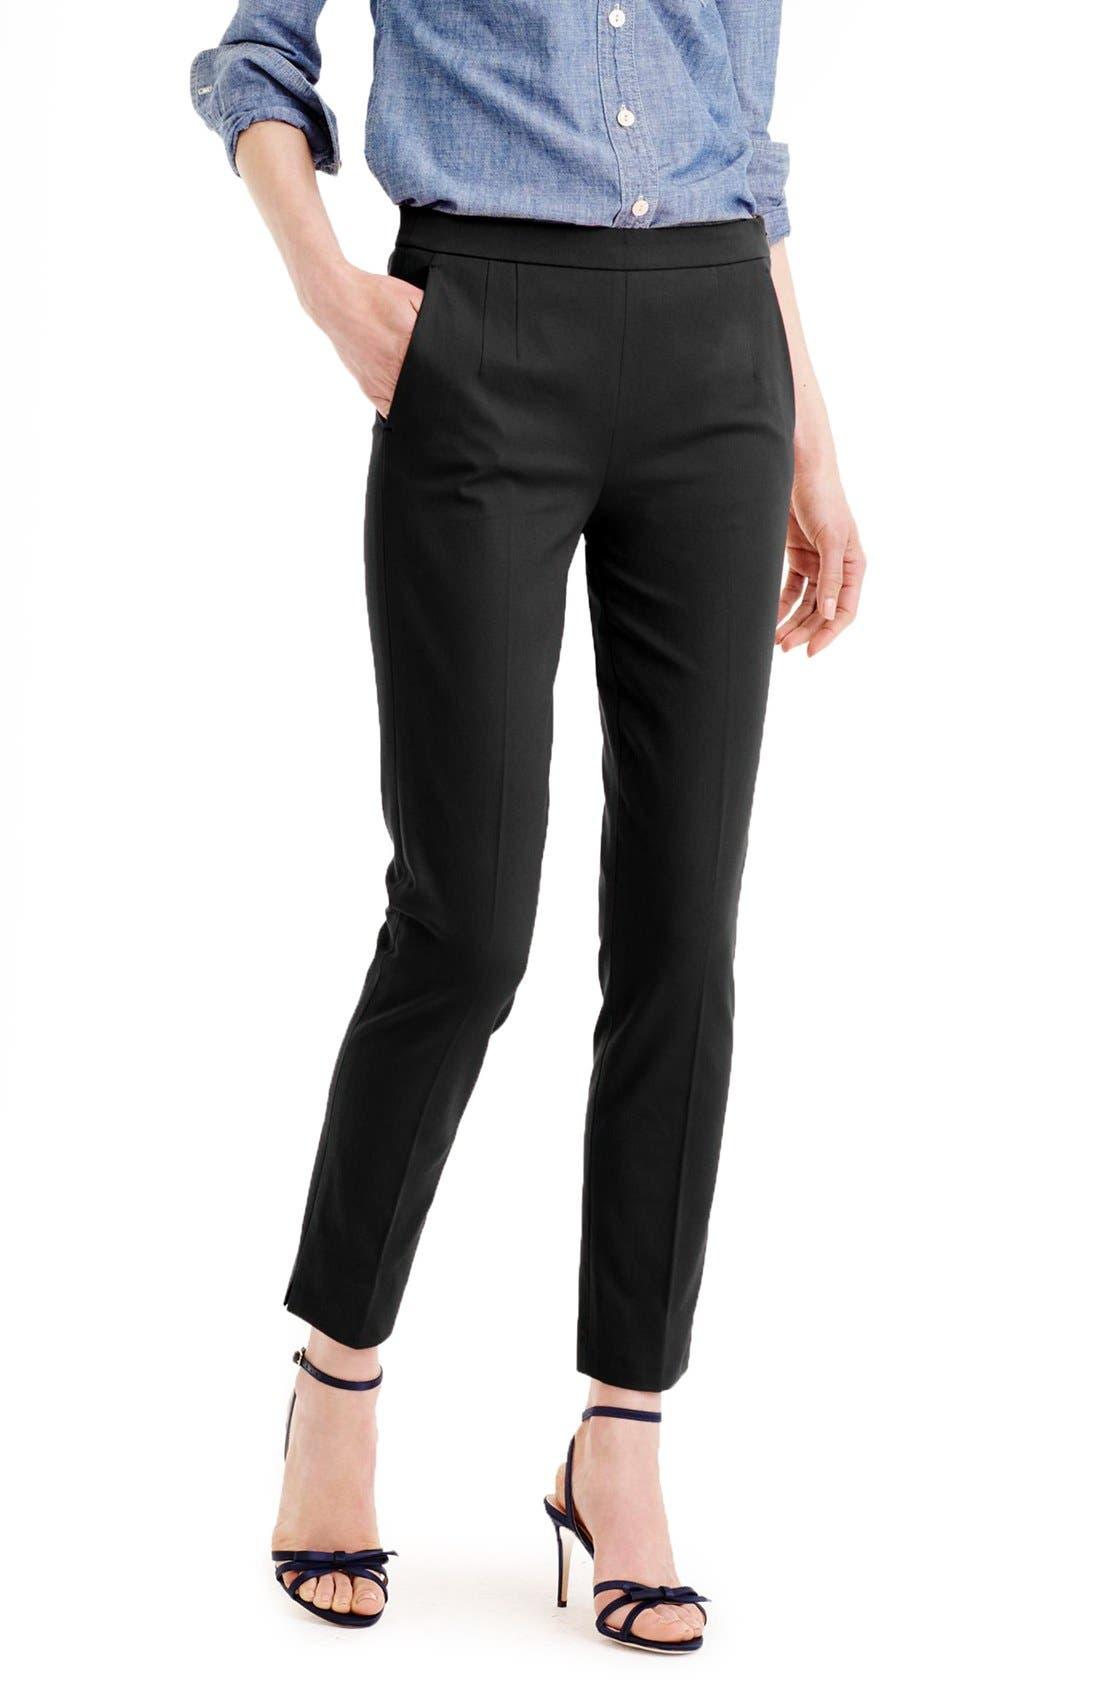 Main Image - J.Crew 'Martie' Bi-Stretch Cotton Blend Pants (Regular & Petite)